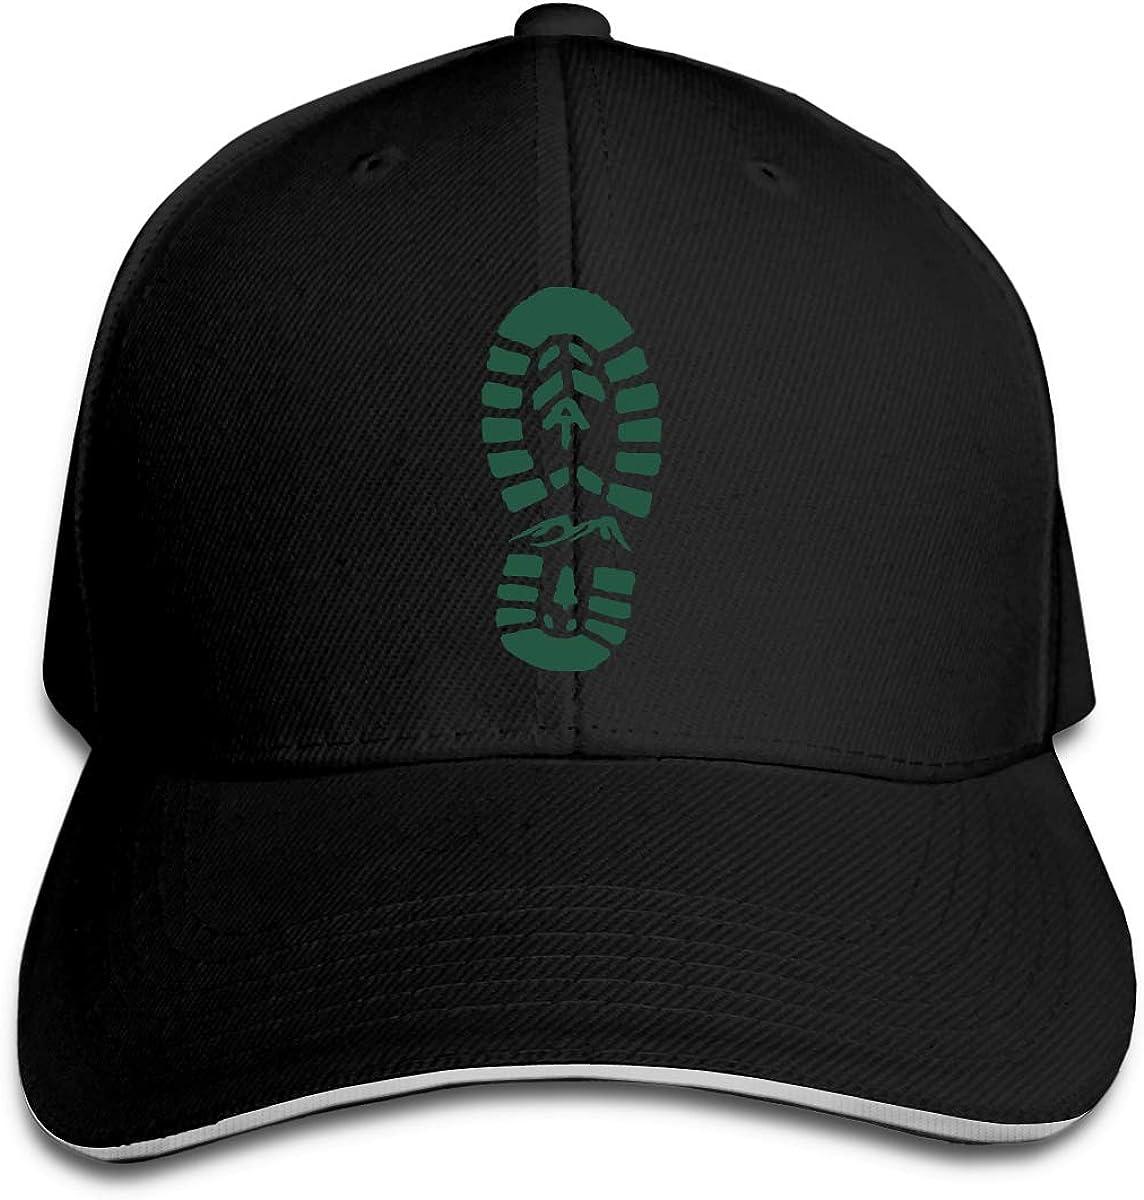 Appalachian Trail Marker Hike Hiker Classic Adjustable Cotton Baseball Caps Trucker Driver Hat Outdoor Cap Black